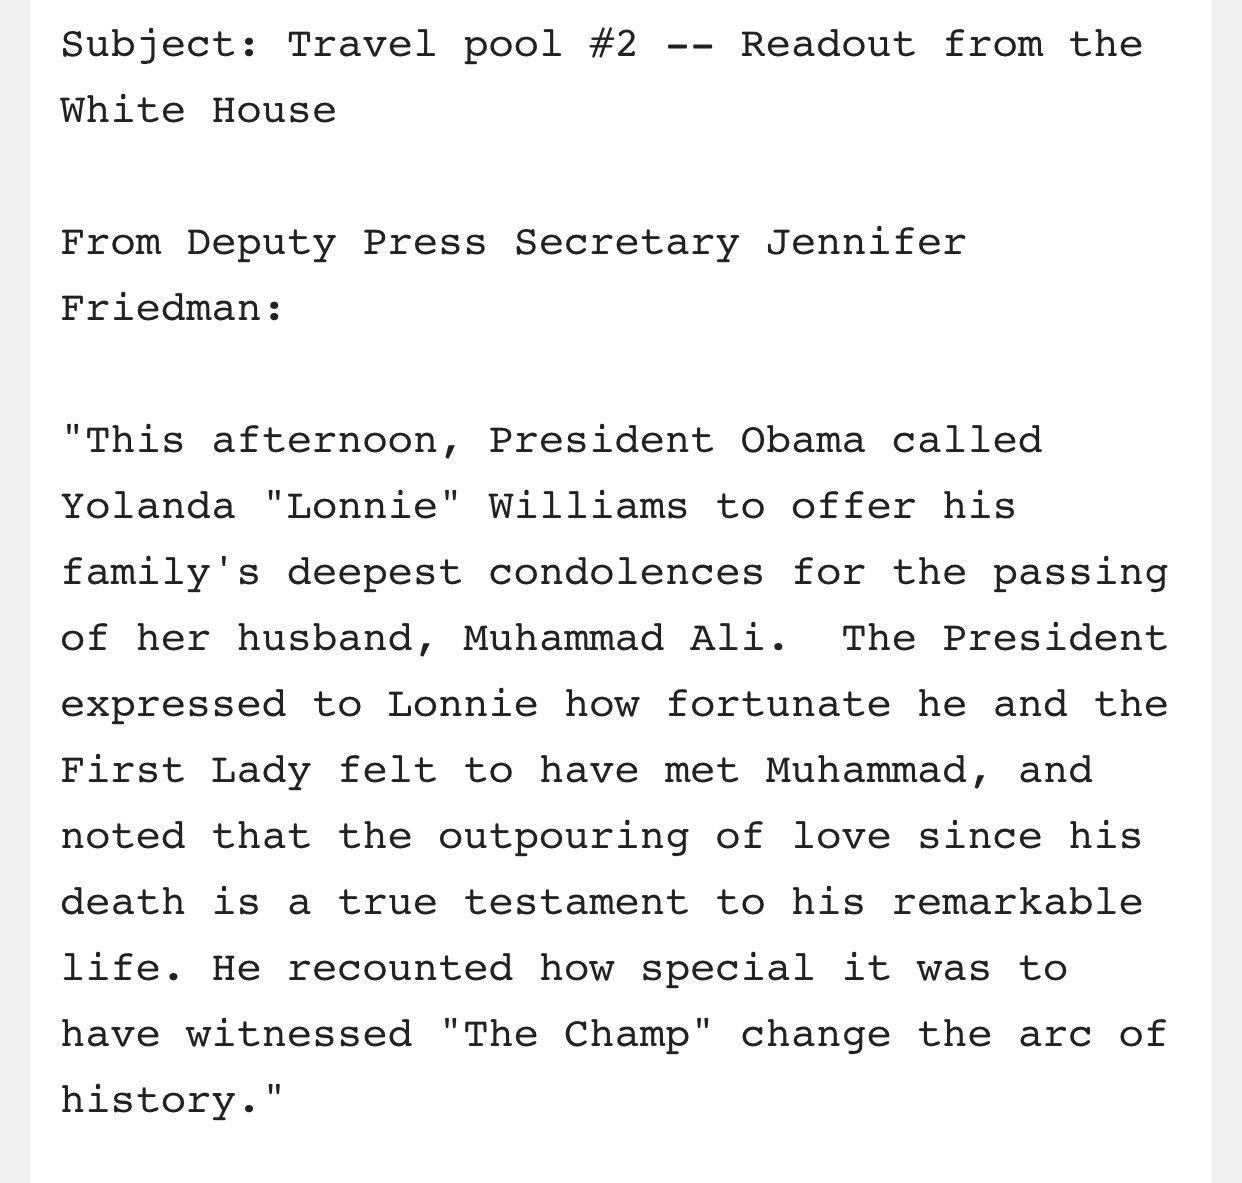 "This afternoon, President Obama called Muhammad Ali's widow, Yolanda ""Lonnie"" Williams: https://t.co/olONq9HJI3"